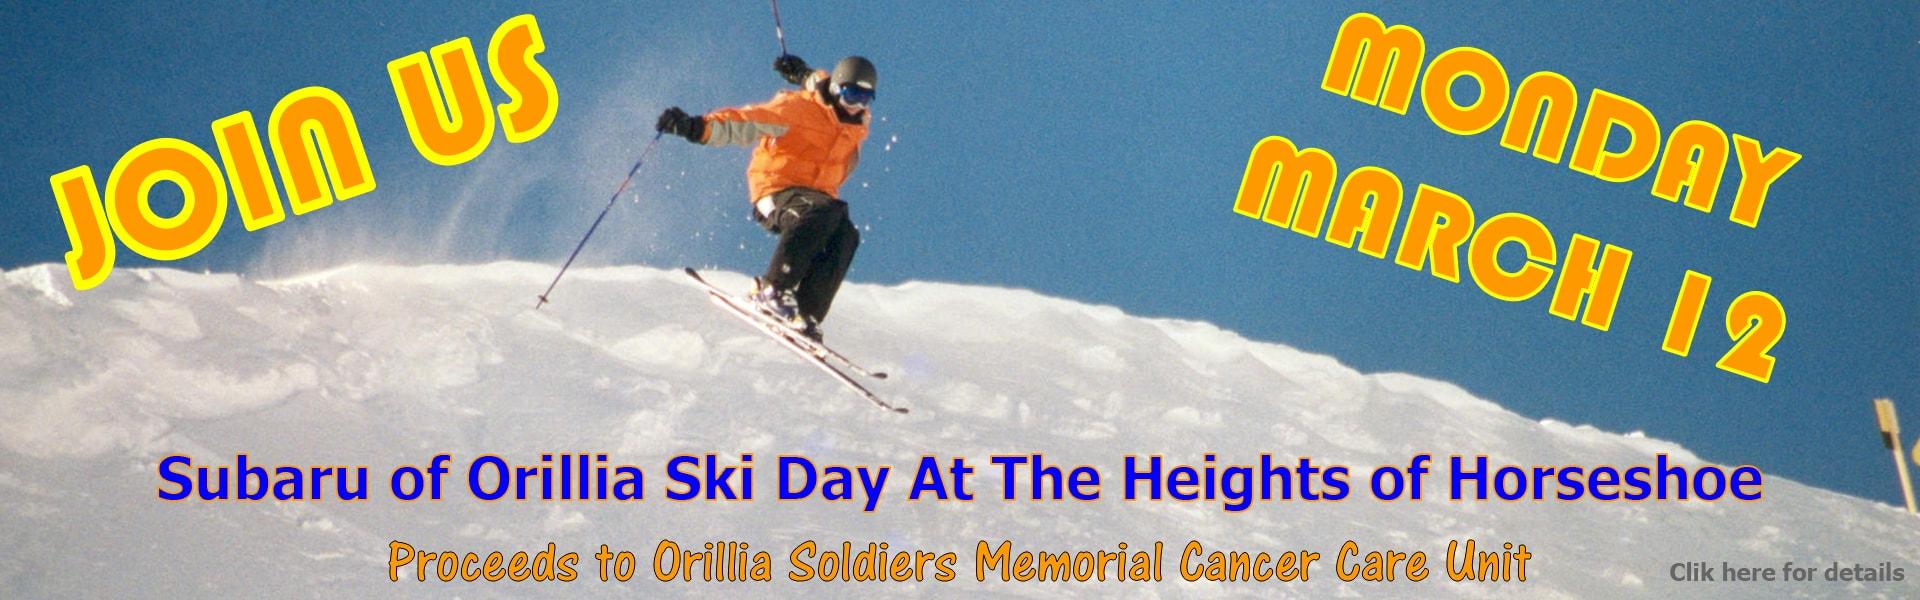 2nd Annual Subaru Ski Day at The Heights of Horseshoe